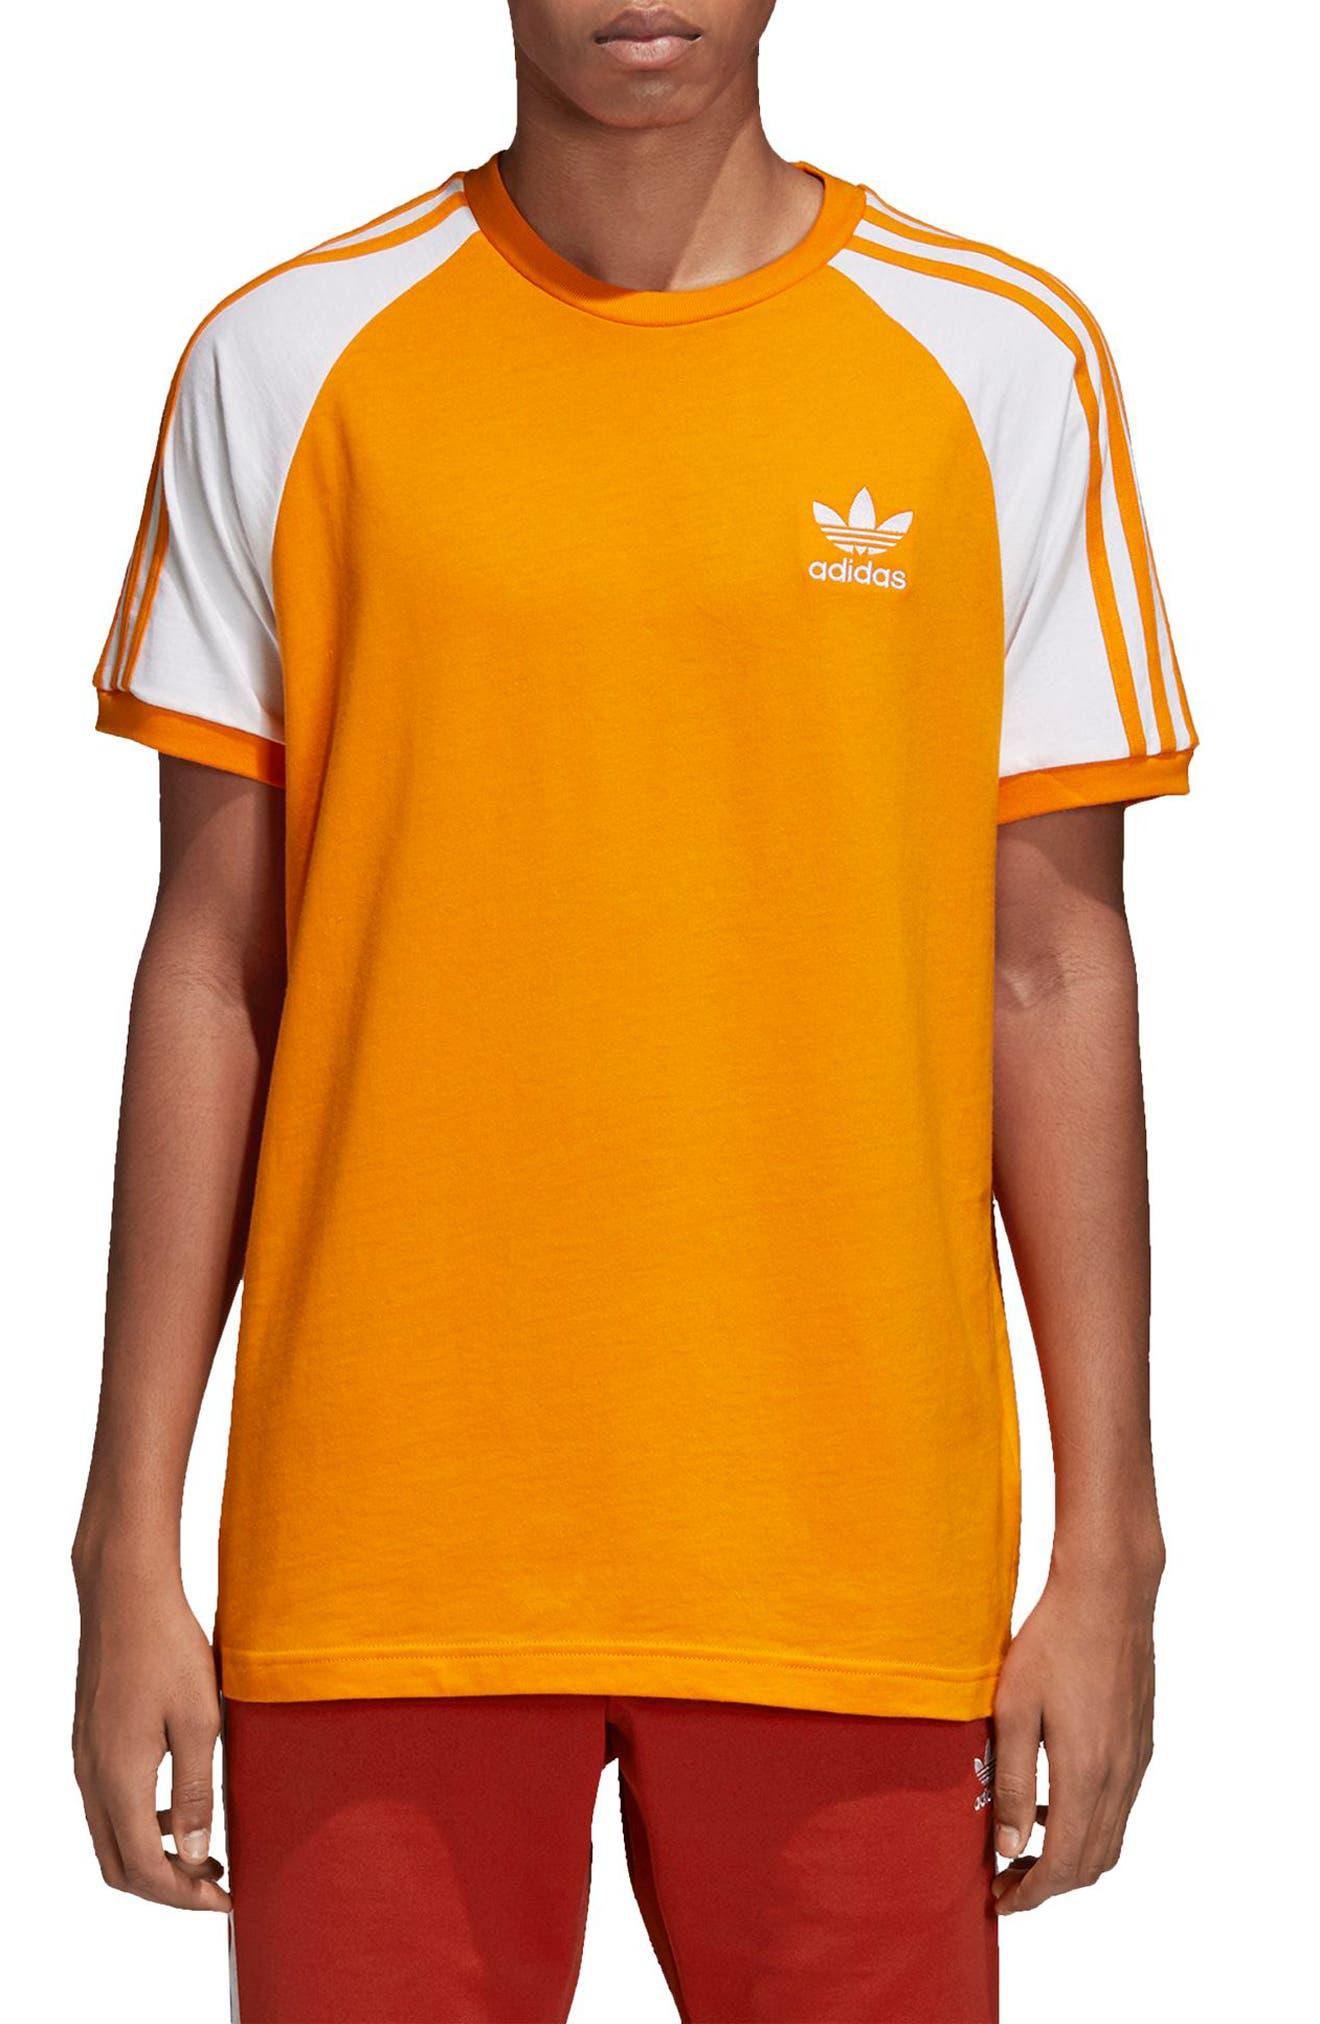 3-Stripes Shirt,                             Main thumbnail 1, color,                             800